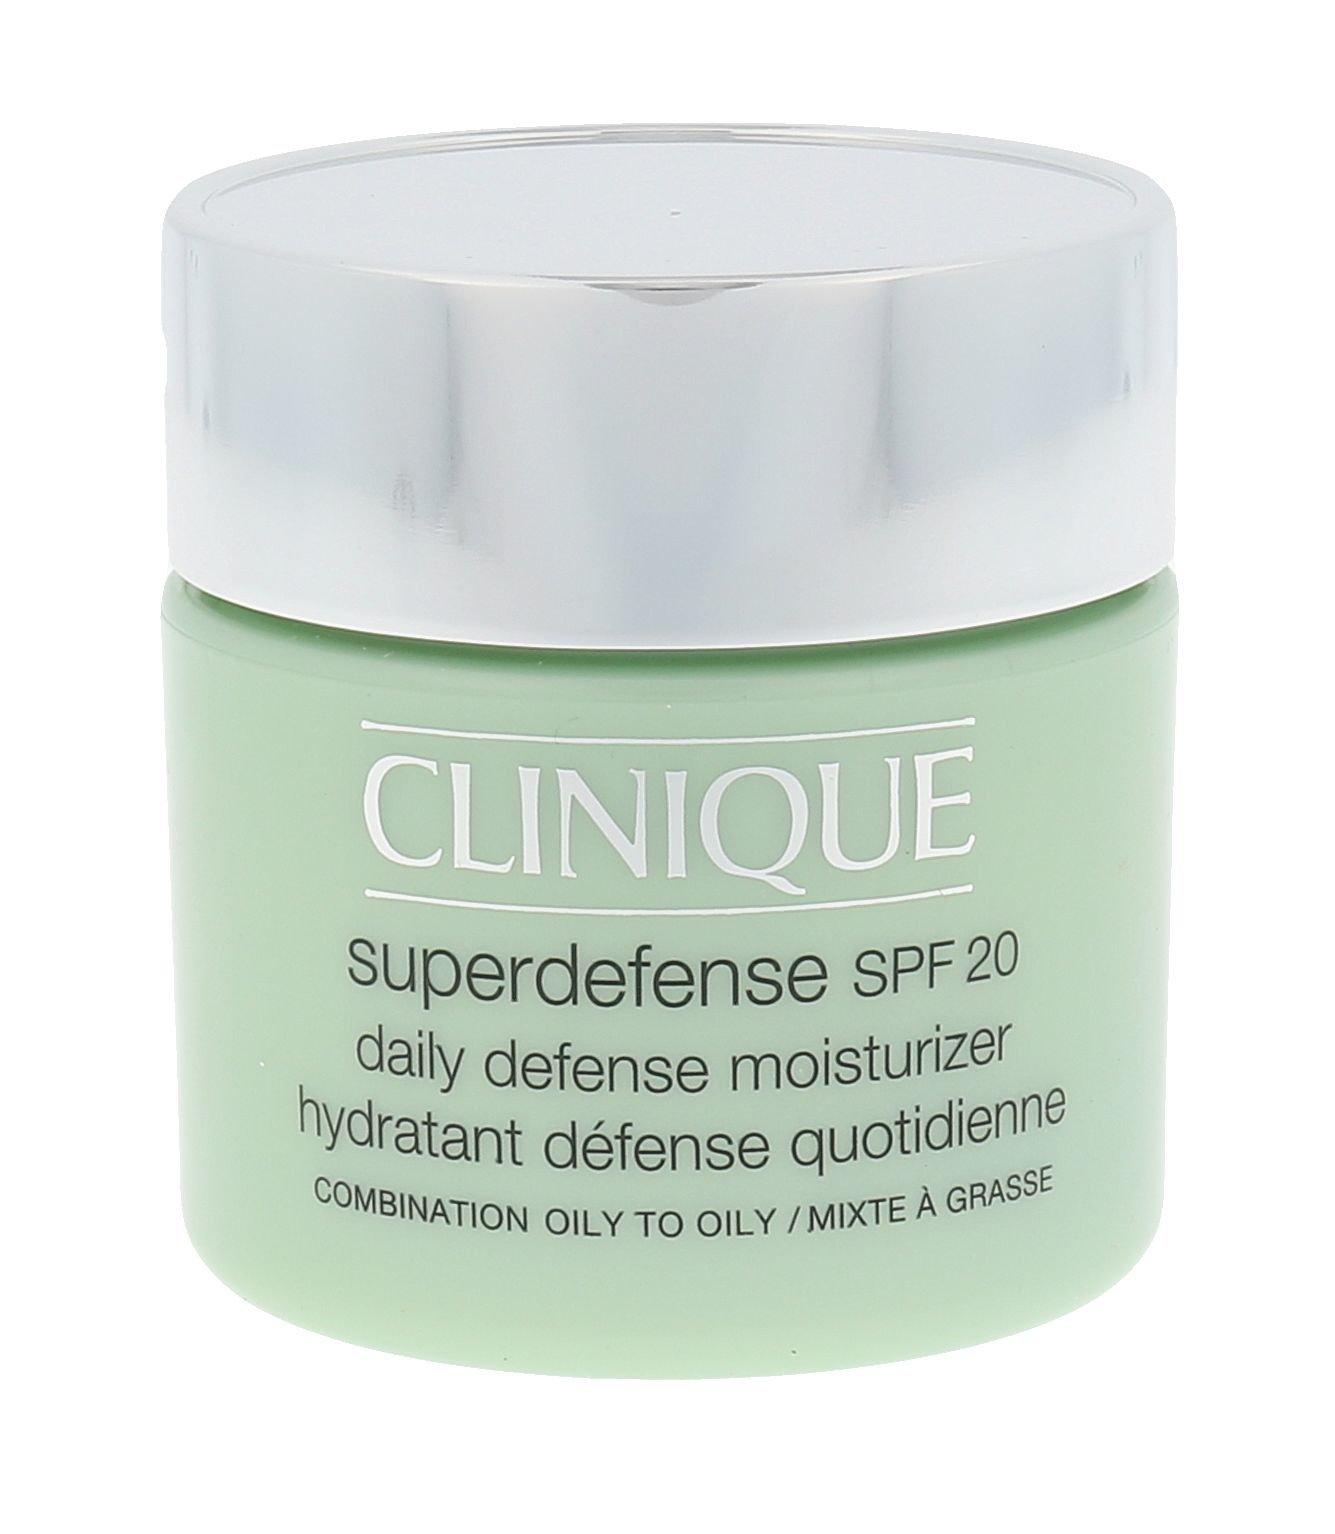 Clinique Superdefense Cosmetic 75ml  Daily Defense Moisturizer